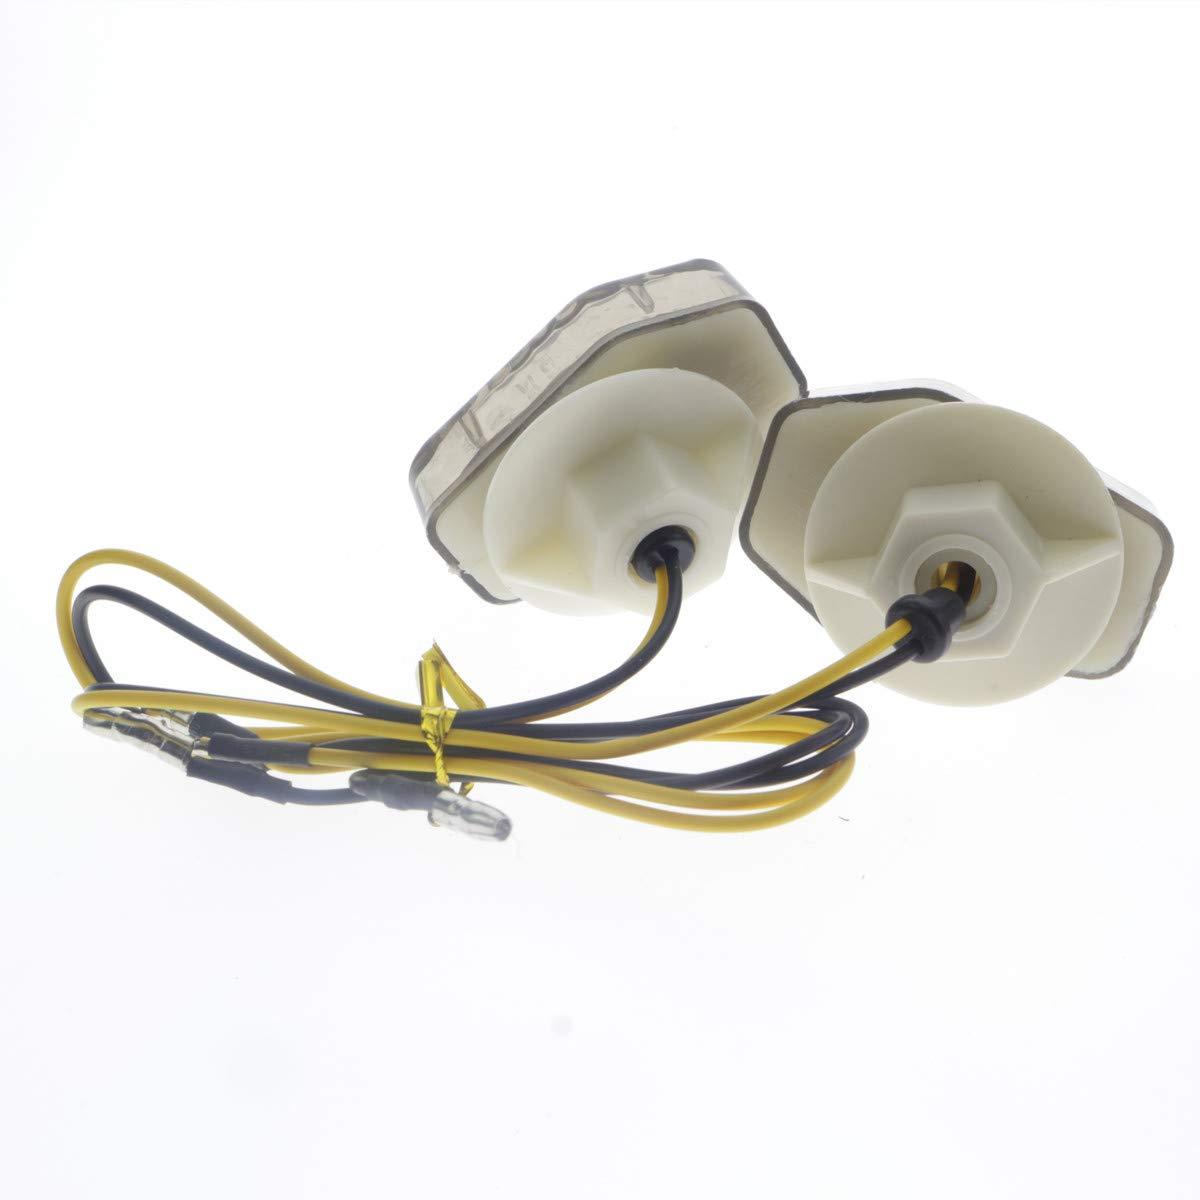 Dunhil 15 Amber LED Flush Mount Turn Signals Universal Indicator Blinker Light For Sport bike Suzuki Honda Yamaha Kawasaki